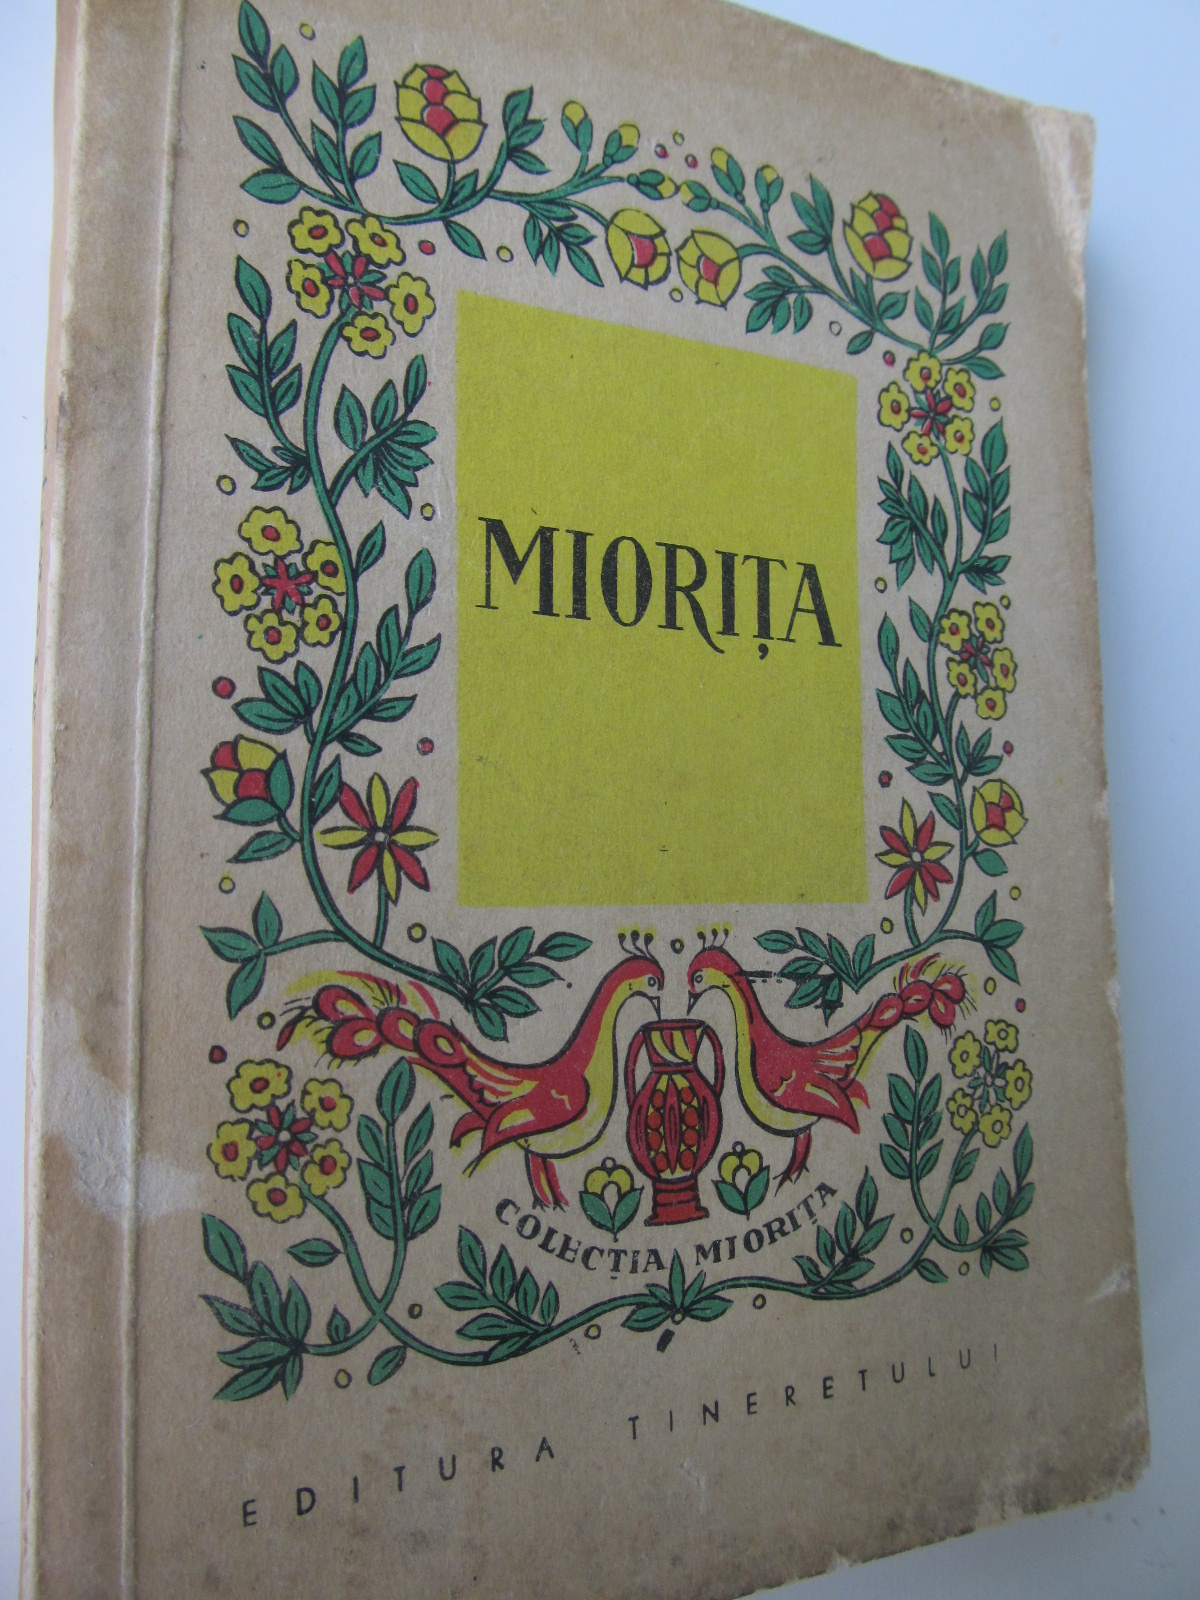 Miorita - Balade populare - ingijita de I. D. Balan | Detalii carte